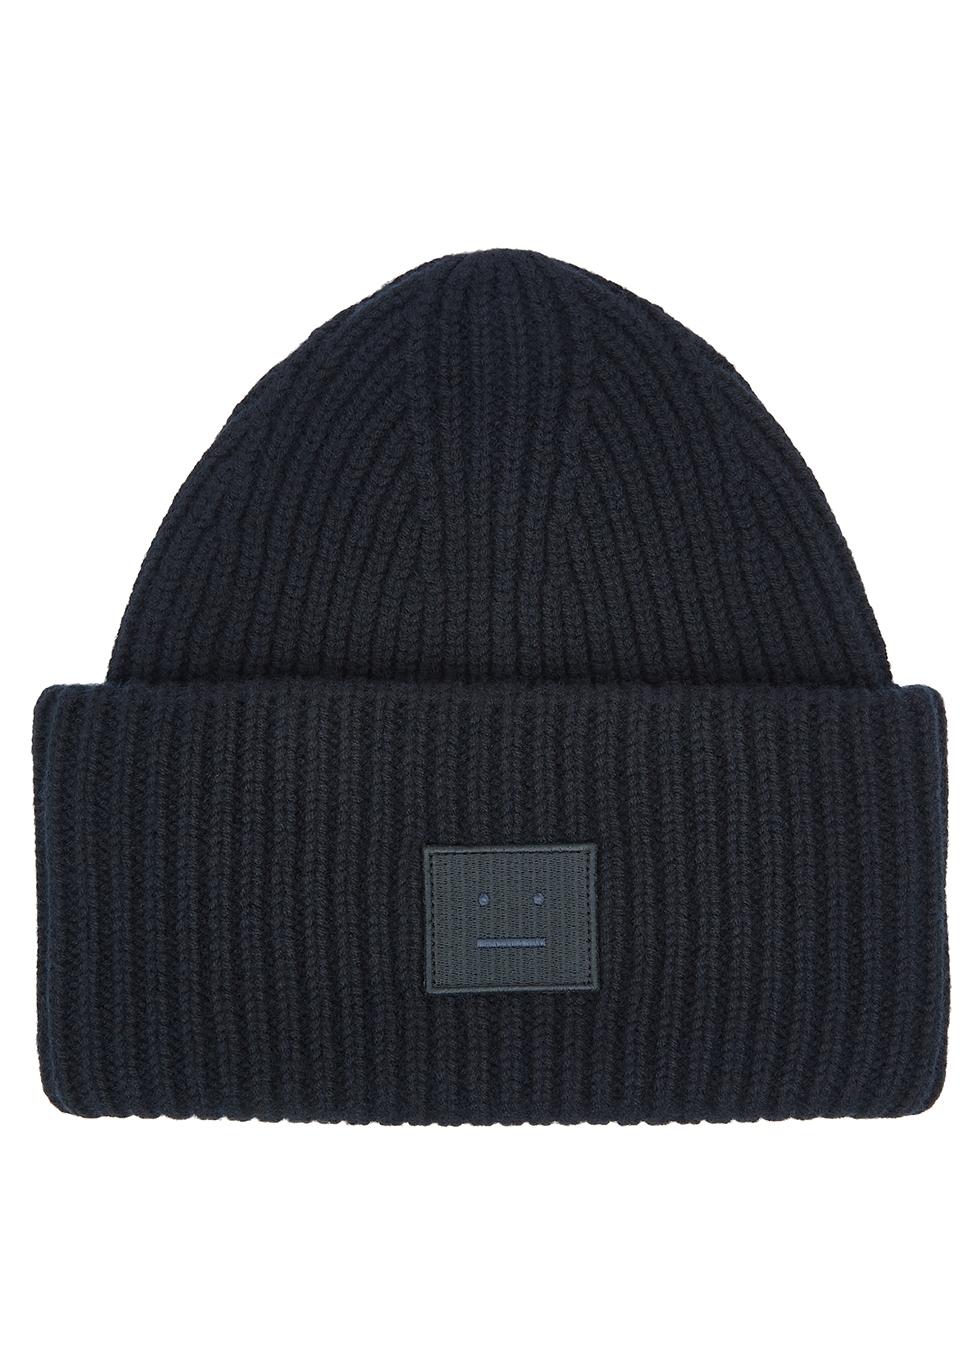 e6d9357a37292c Designer Beanies - Women's Luxury Hats - Harvey Nichols